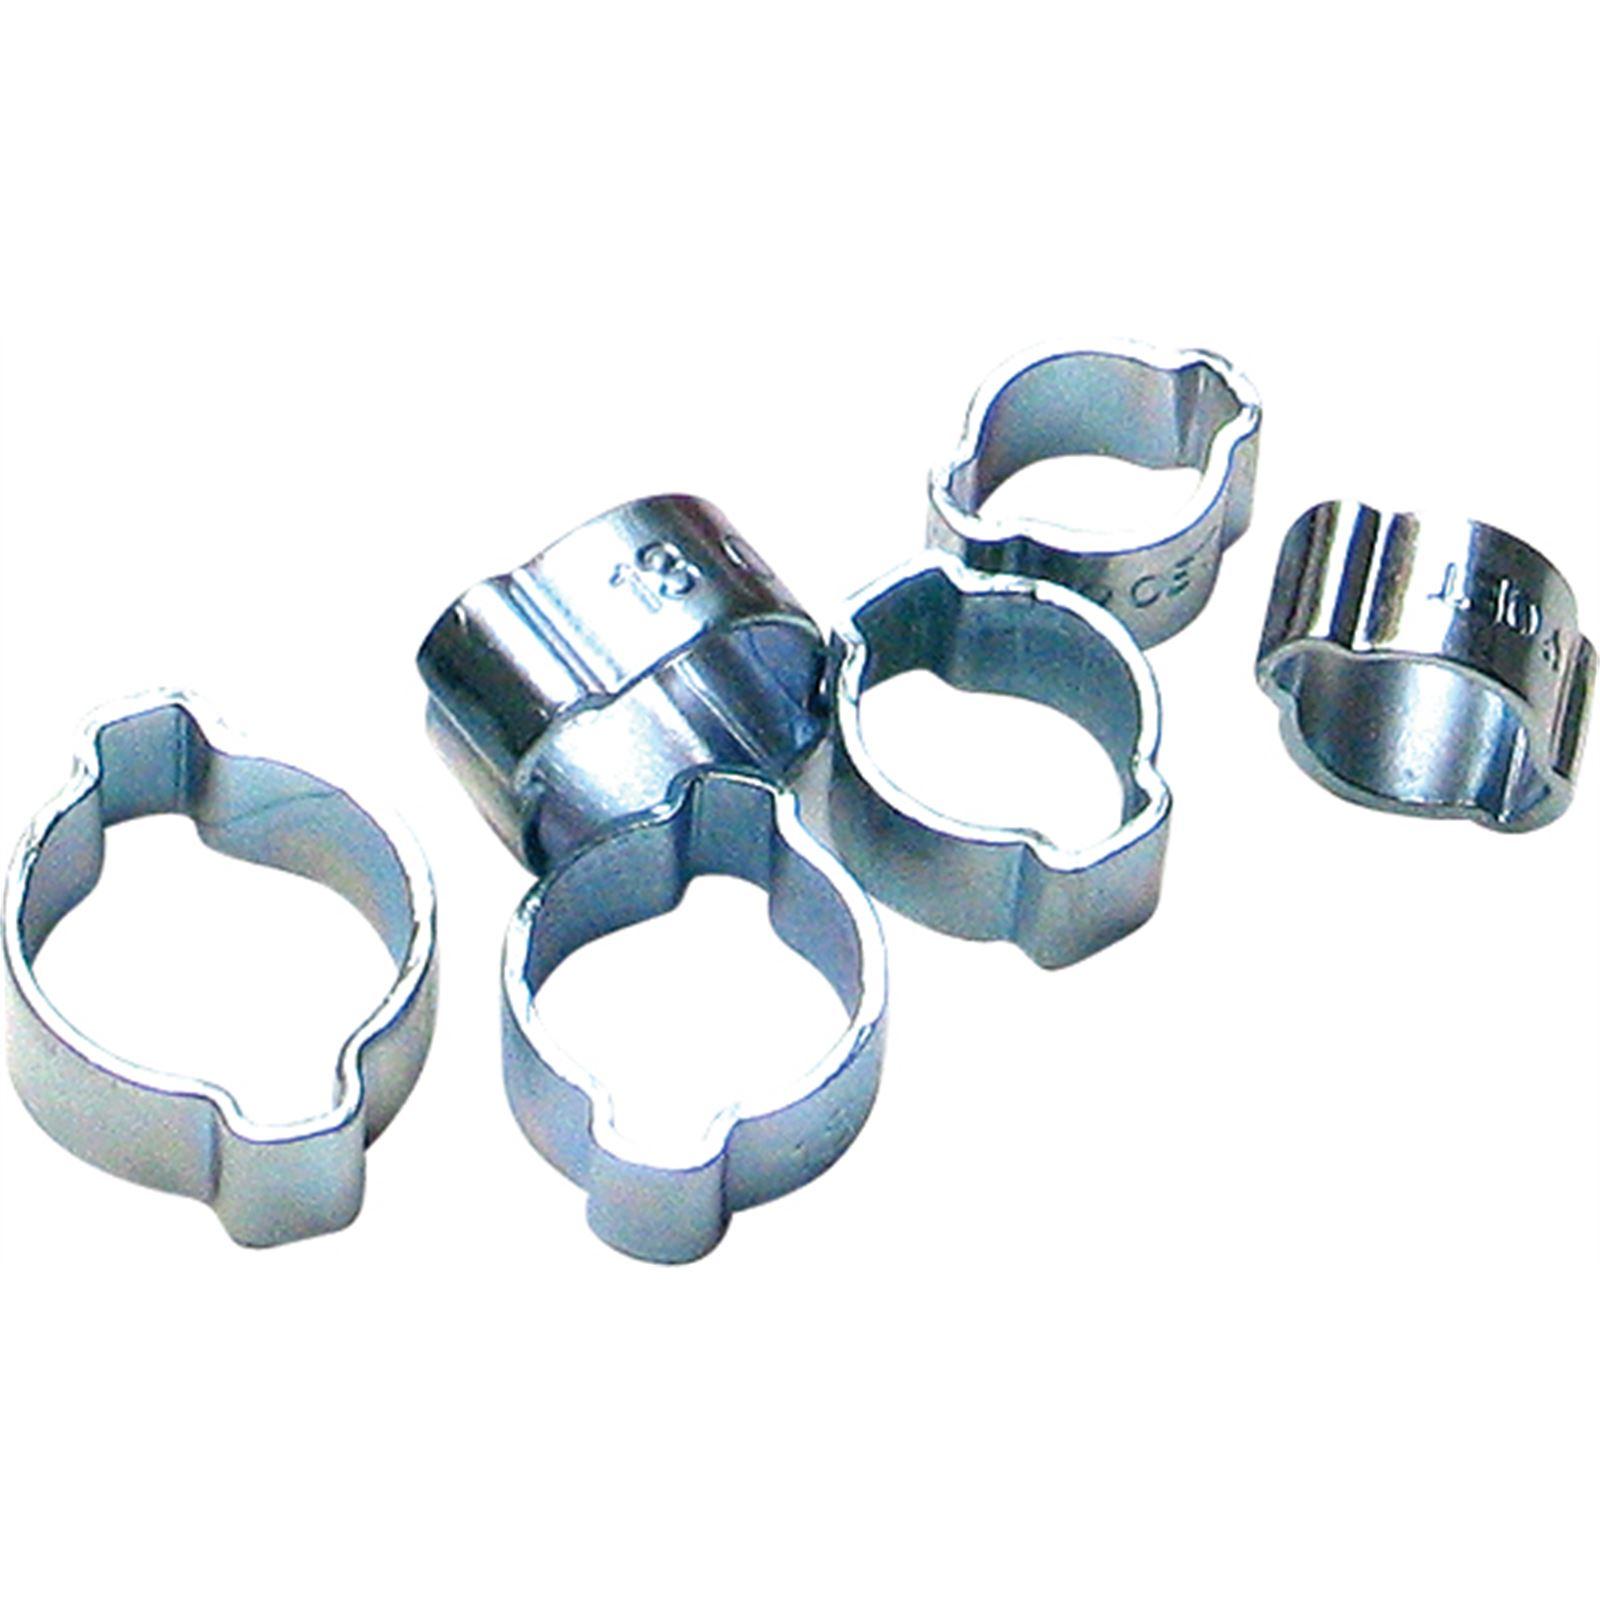 Motion Pro Steel O-Clips